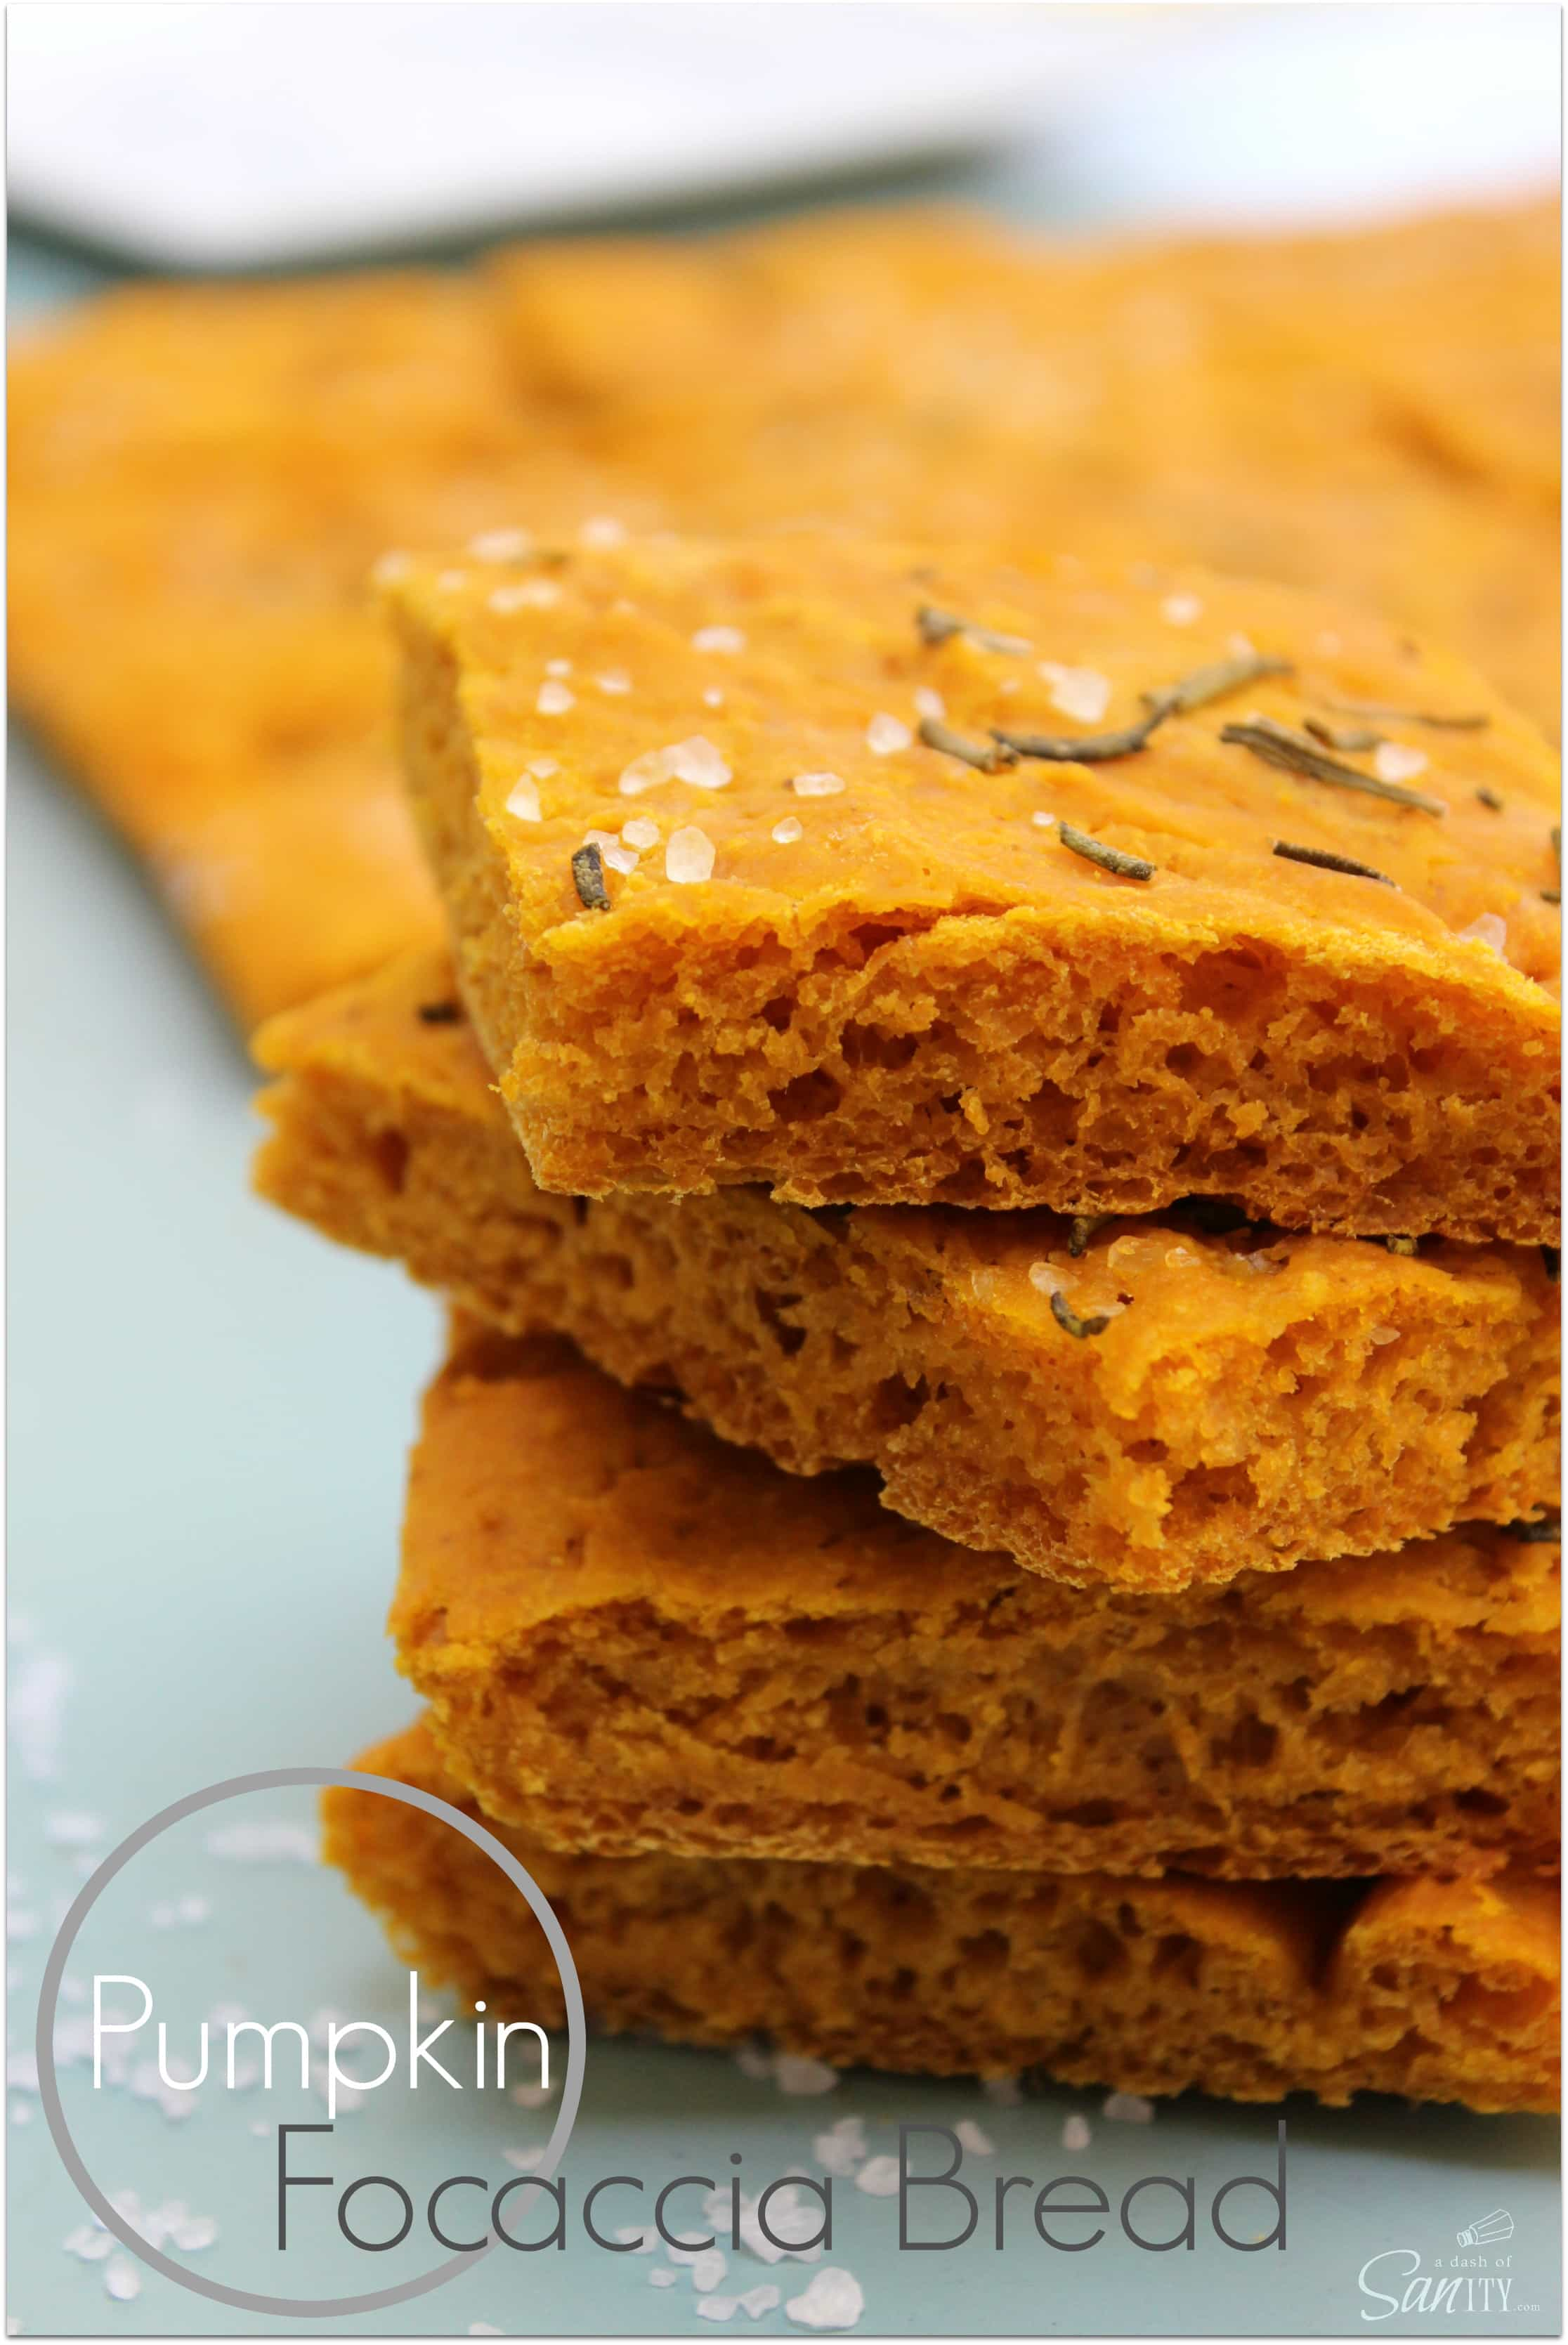 Pumpkin Focaccia Bread